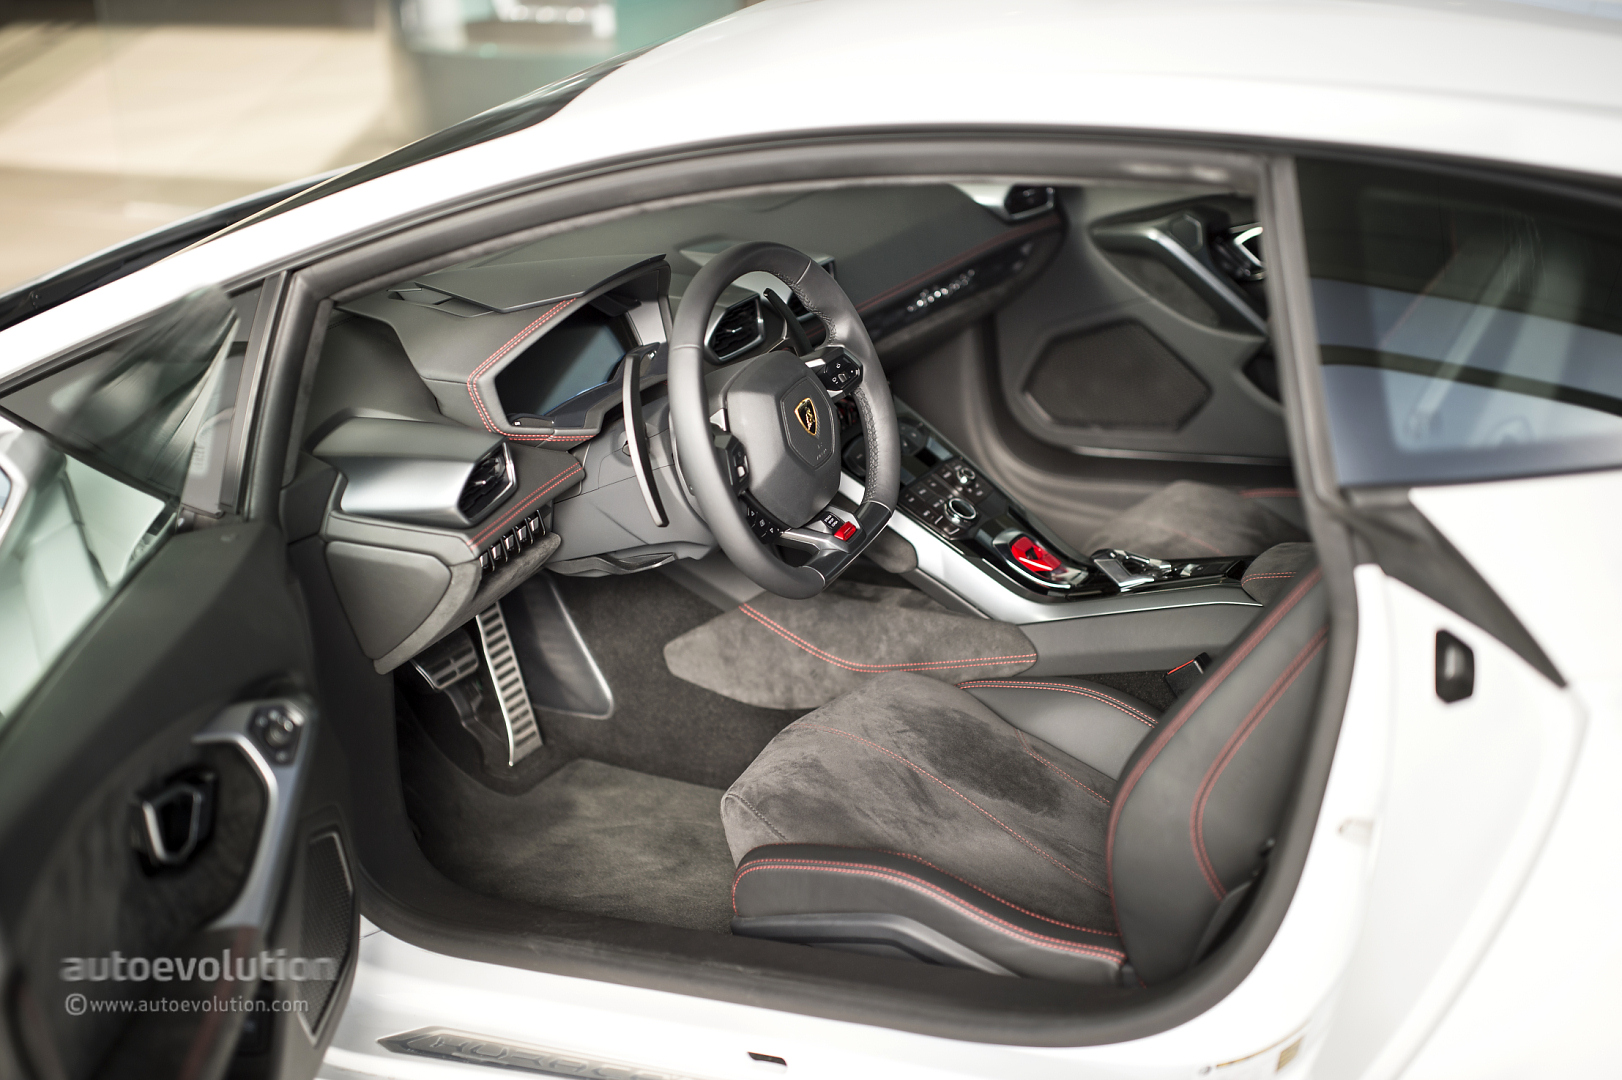 lamborghini huracan lp 610 4 review autoevolution - Lamborghini Huracan Orange Interior